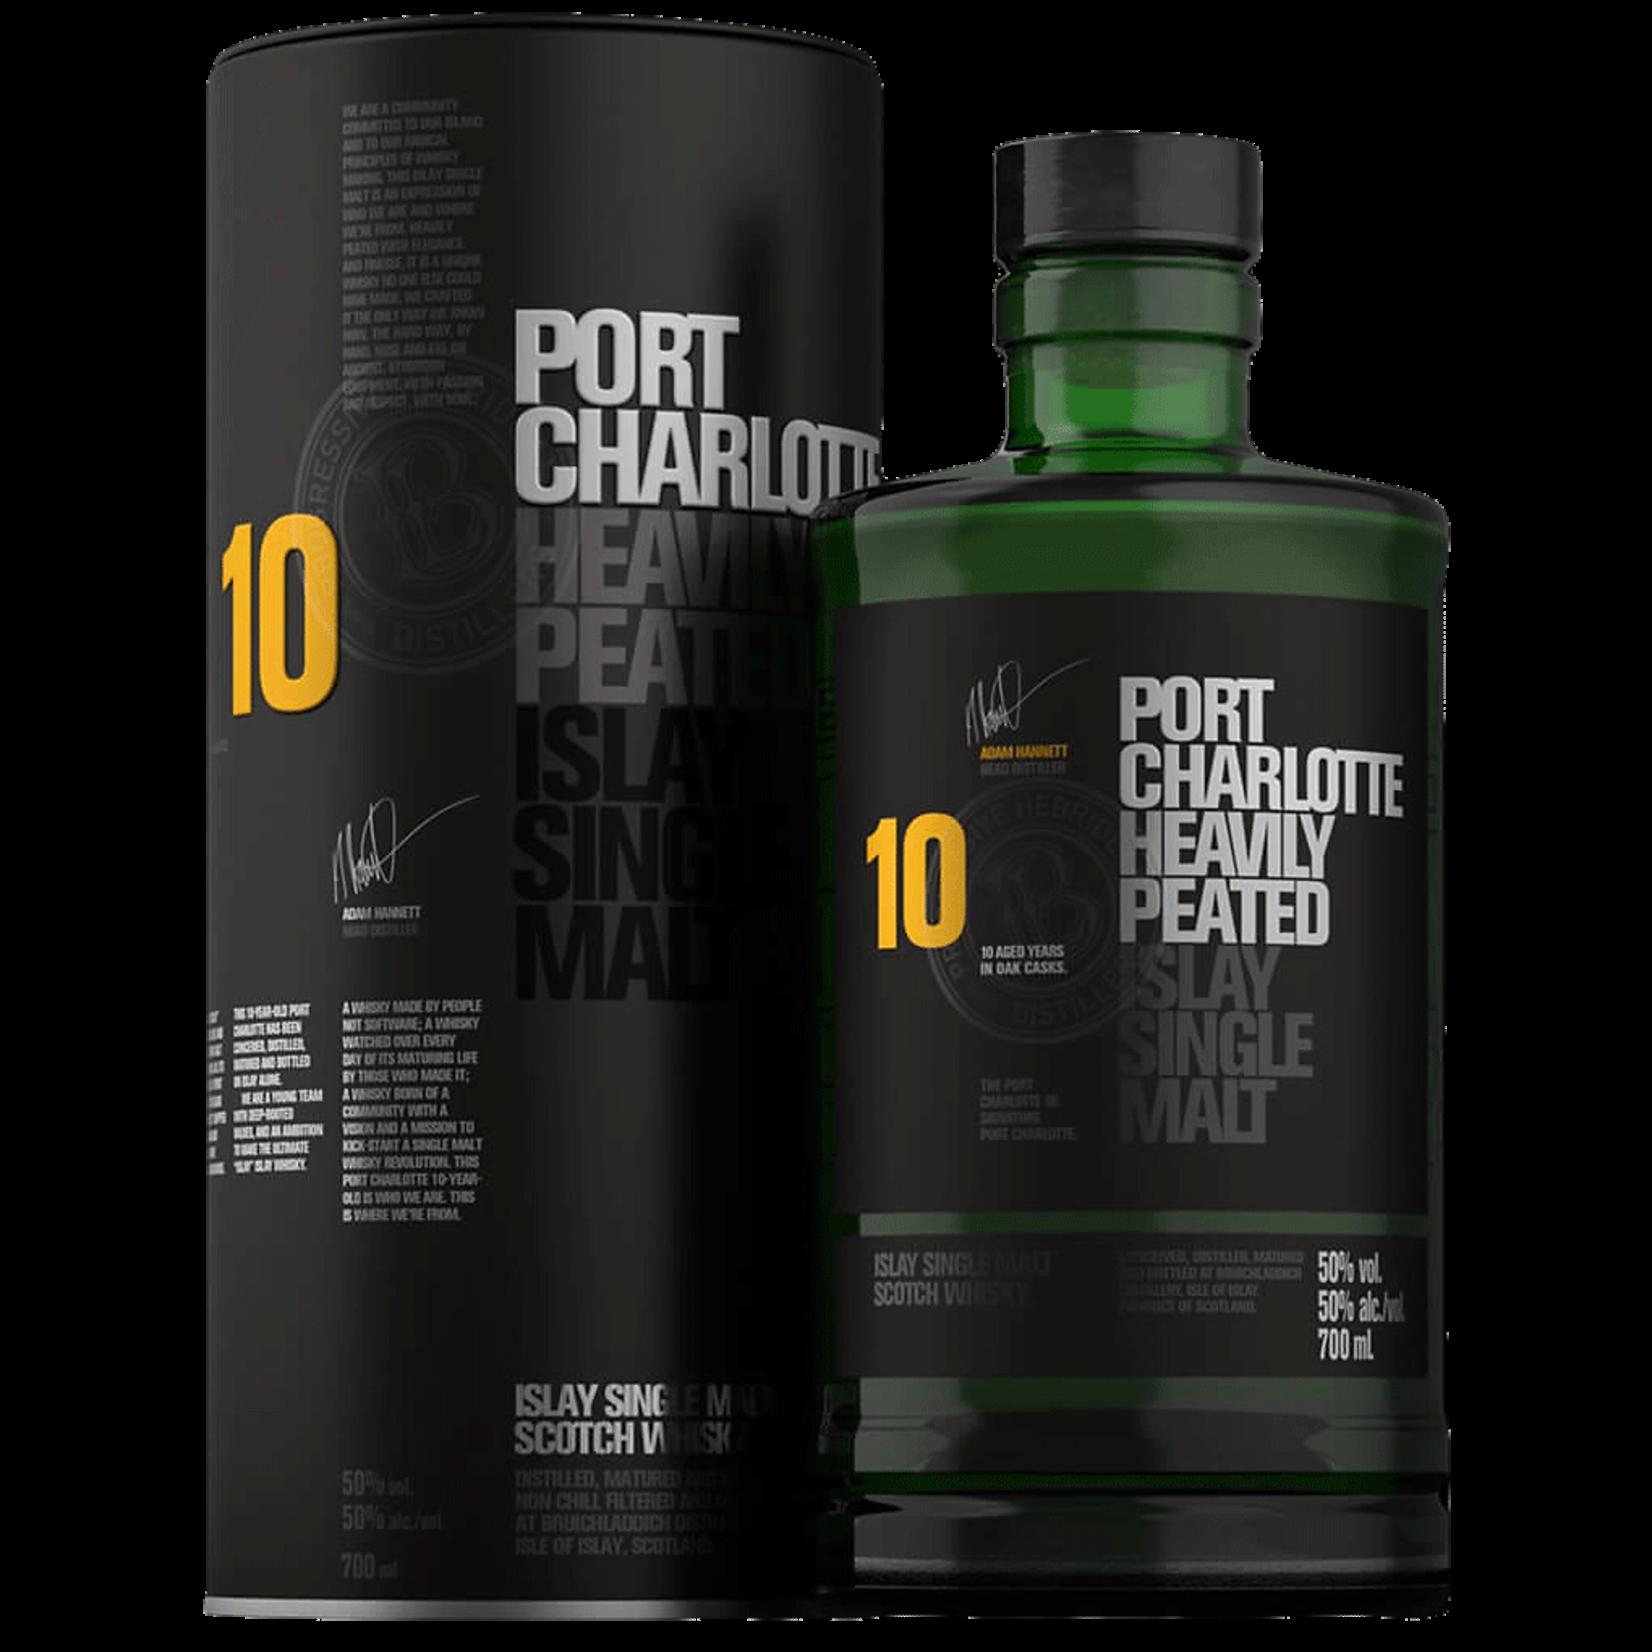 Spirits Bruichladdich Single Malt Scotch Port Charlotte 10 Year Heavily Peated